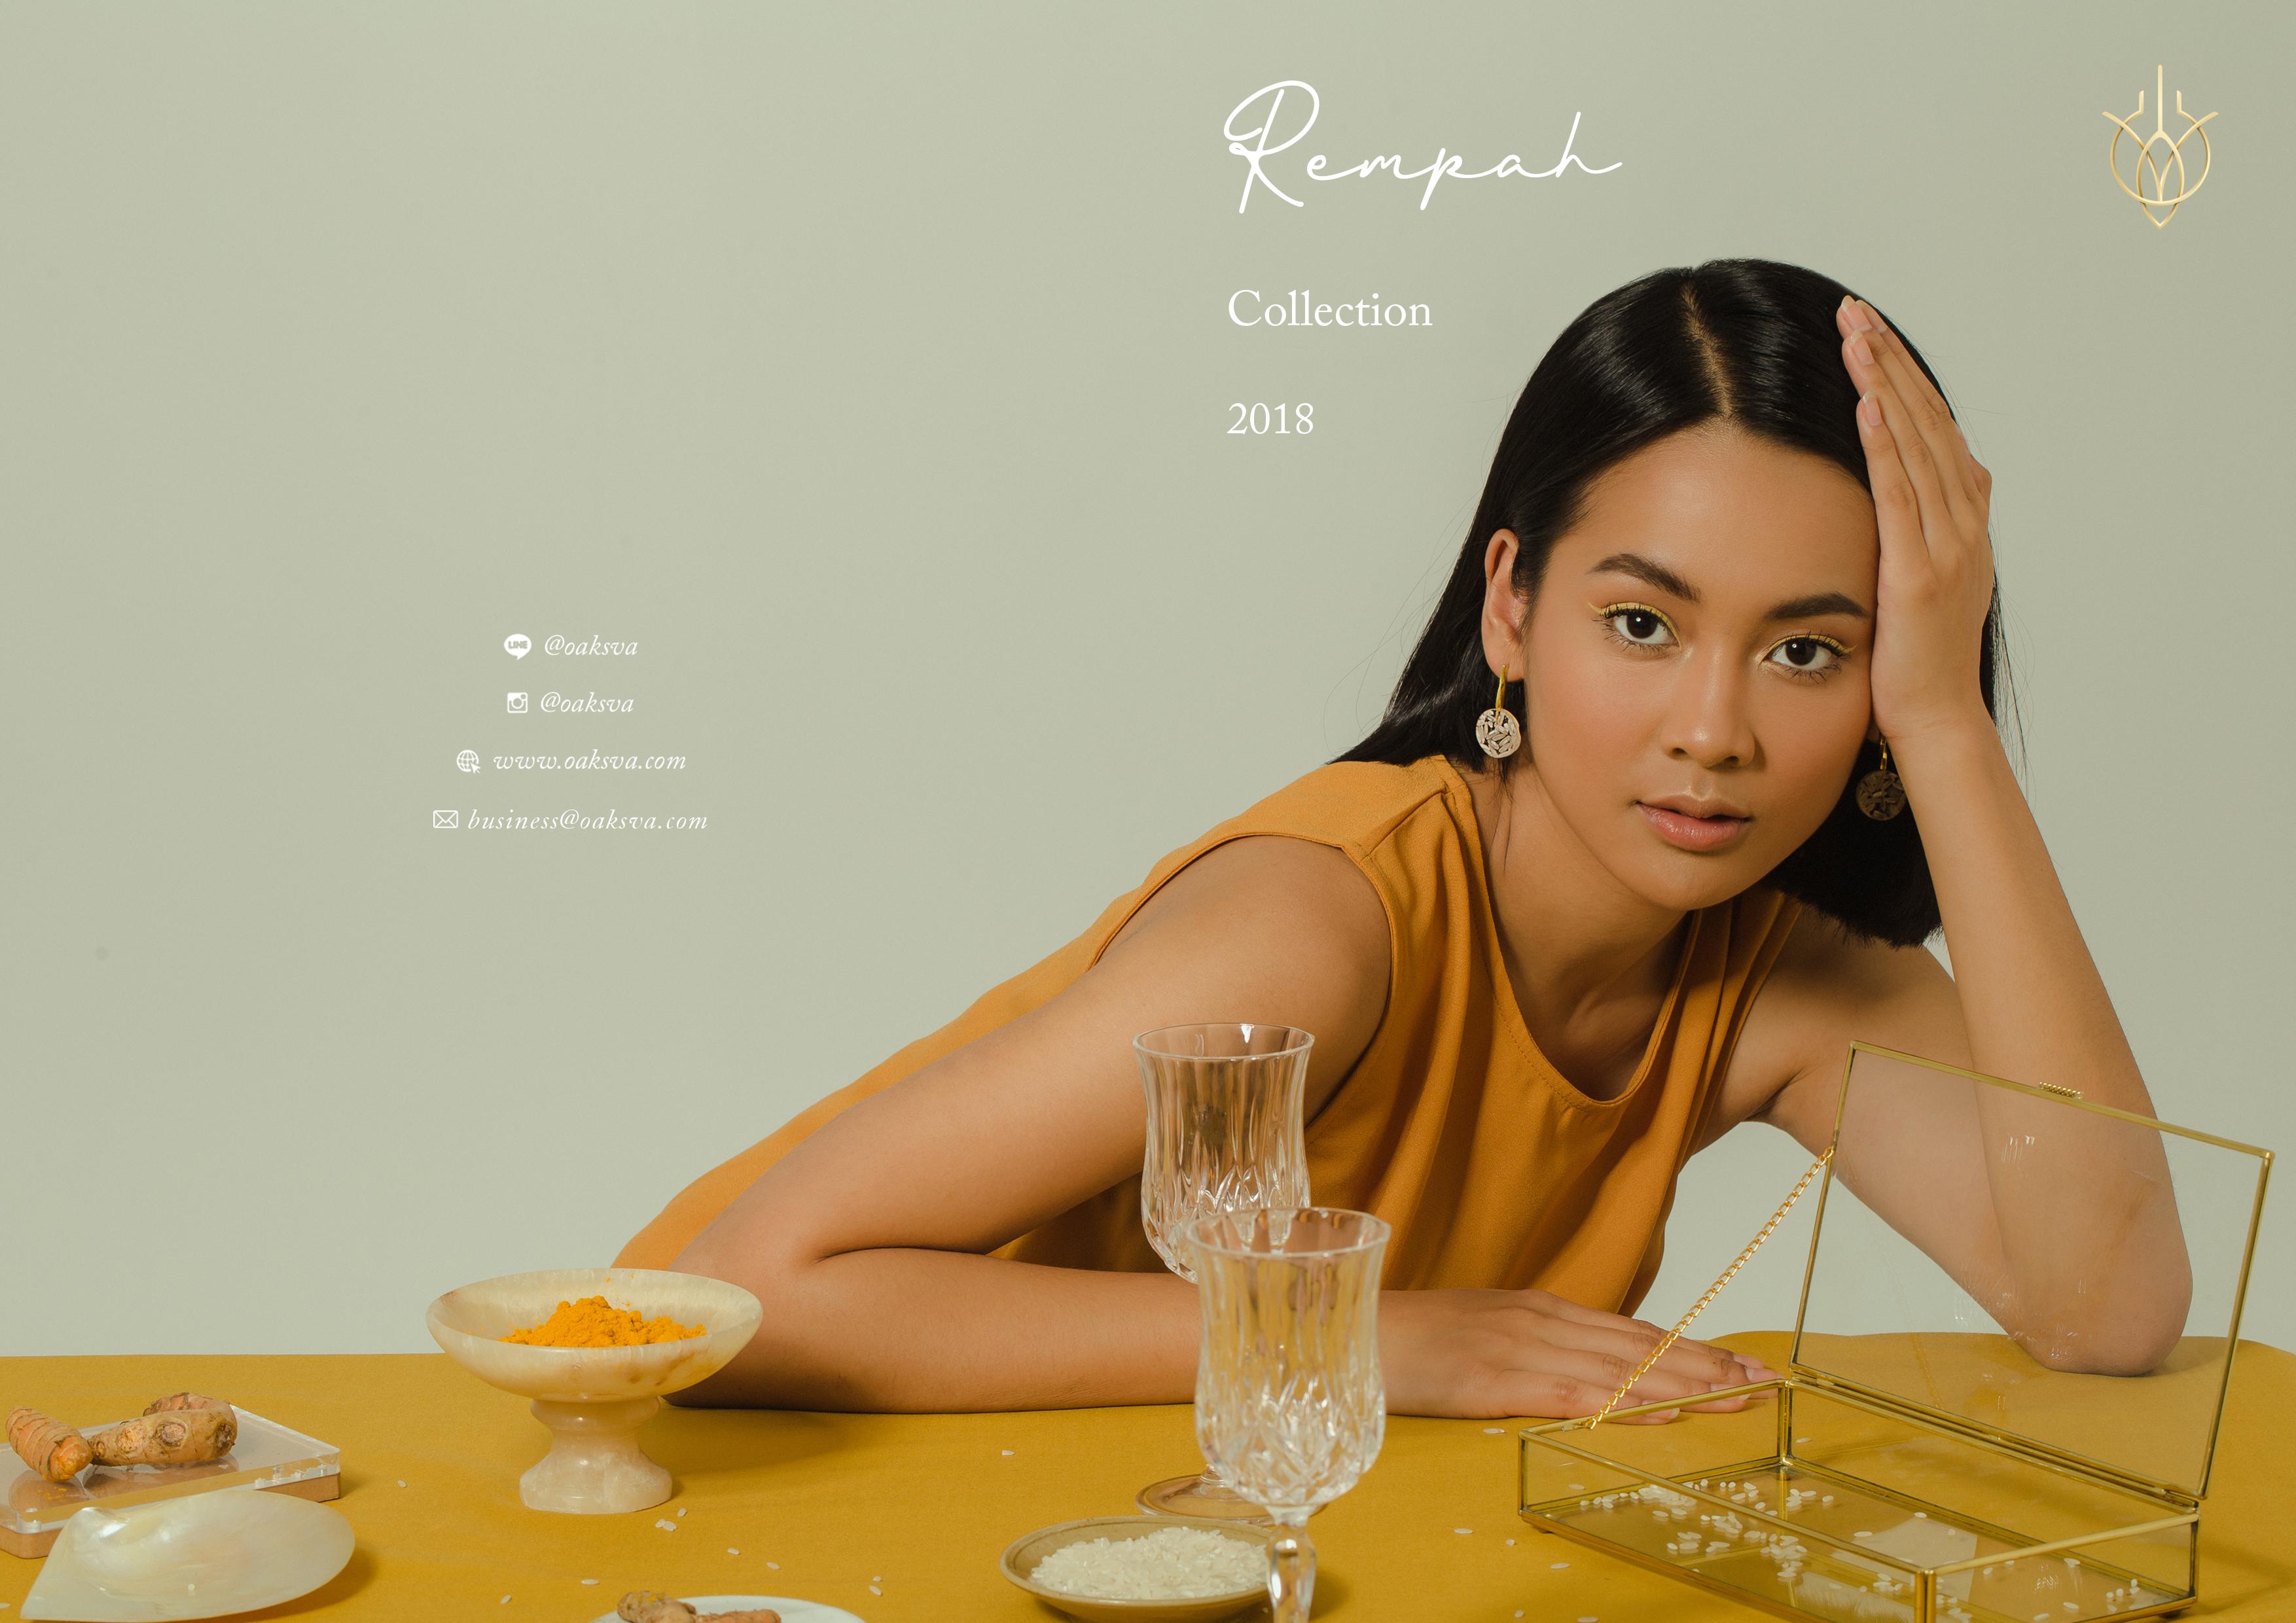 Rempah Collection